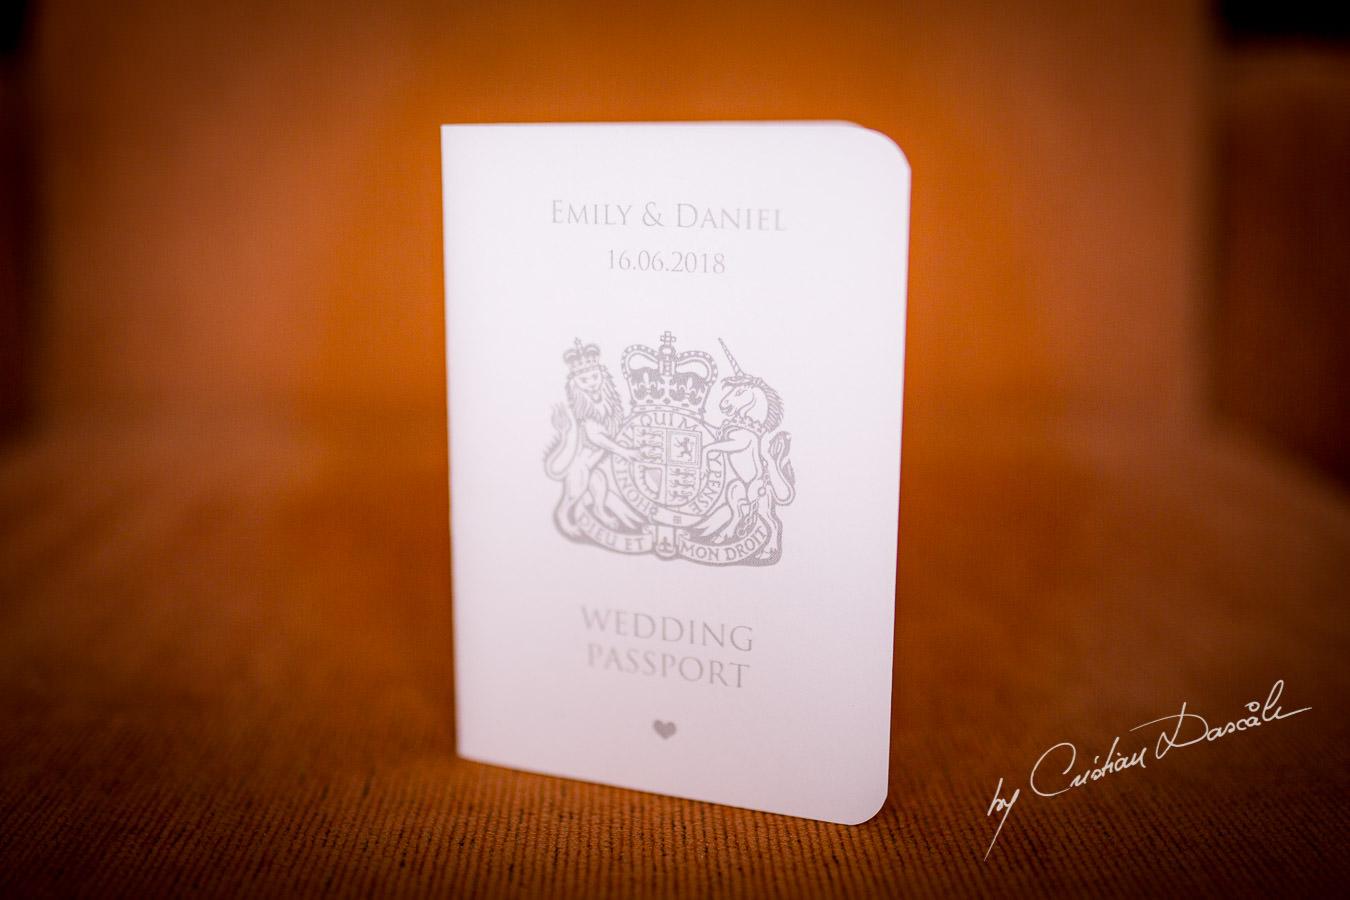 Wedding Passport at a Beautiful Wedding at Elias Beach Hotel captured by Cyprus Photographer Cristian Dascalu.